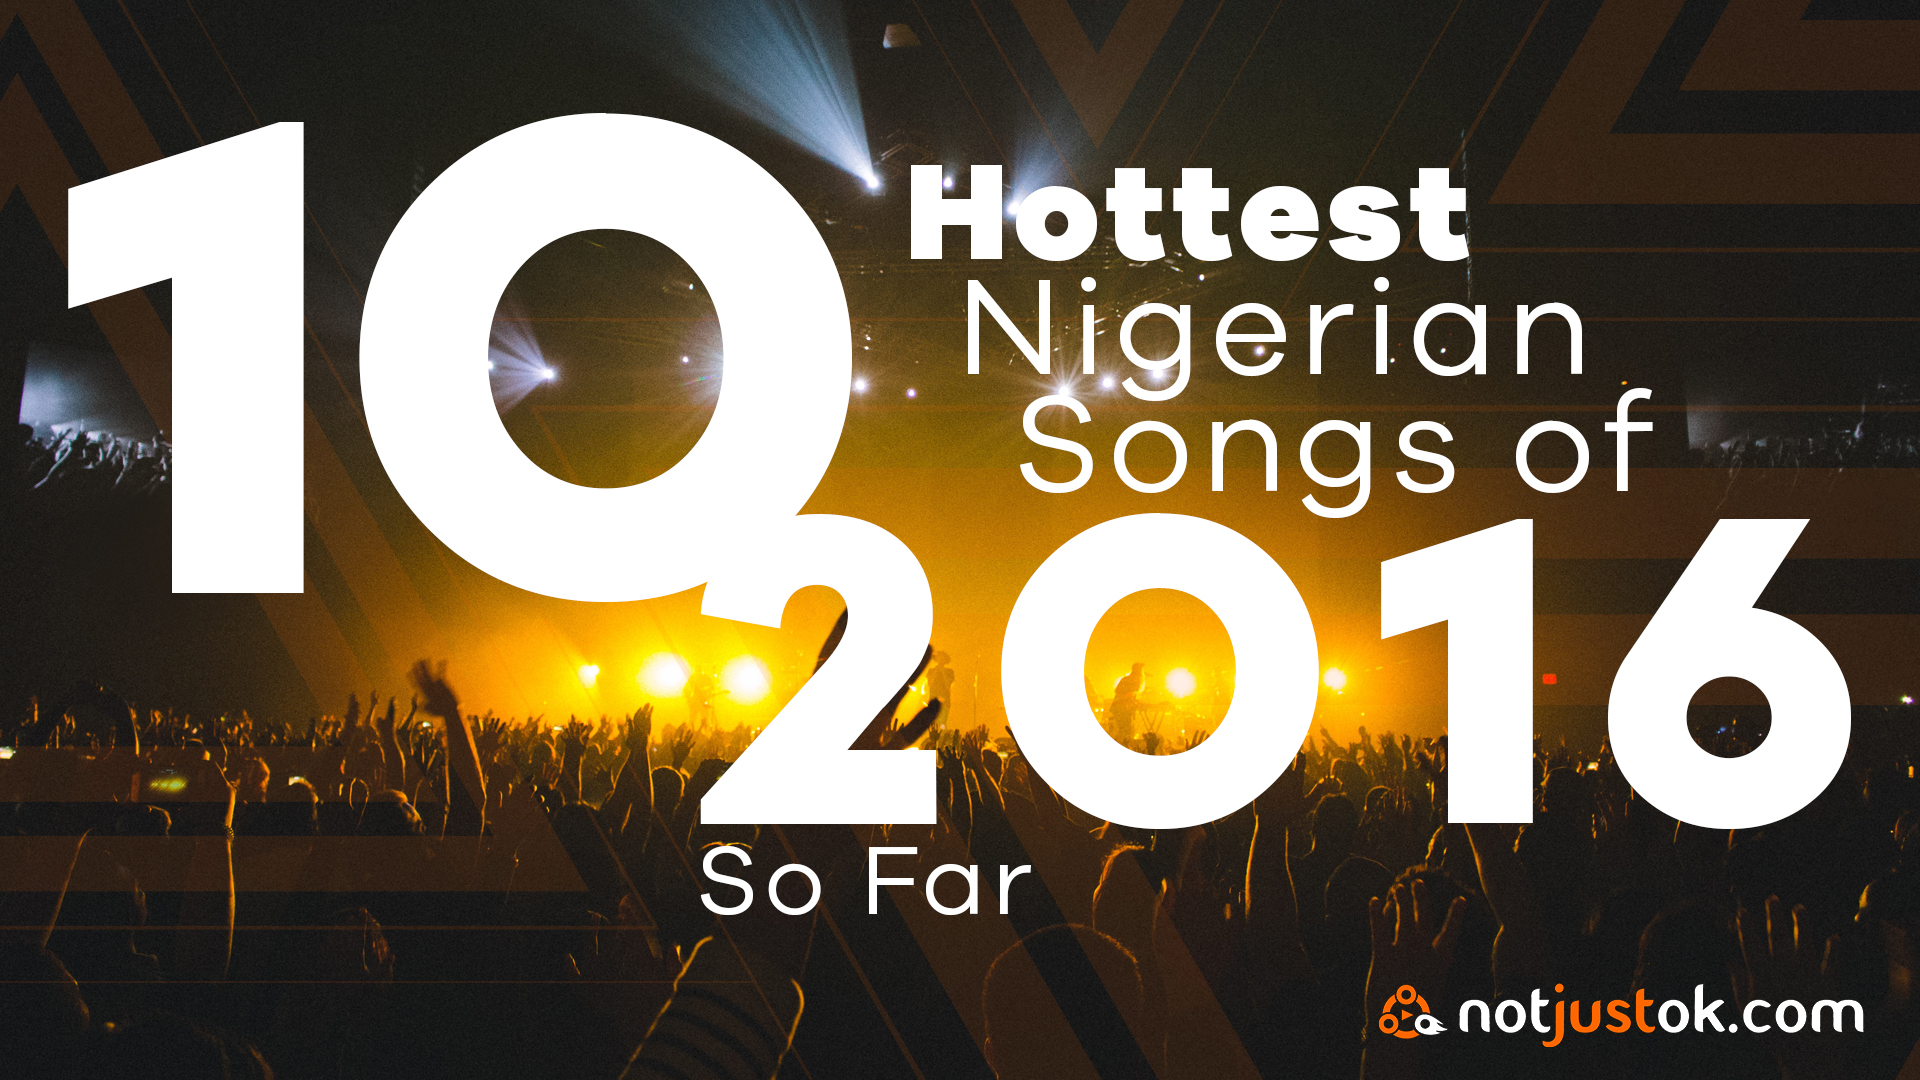 10 Hottest Nigerian Songs of 2016 So Far